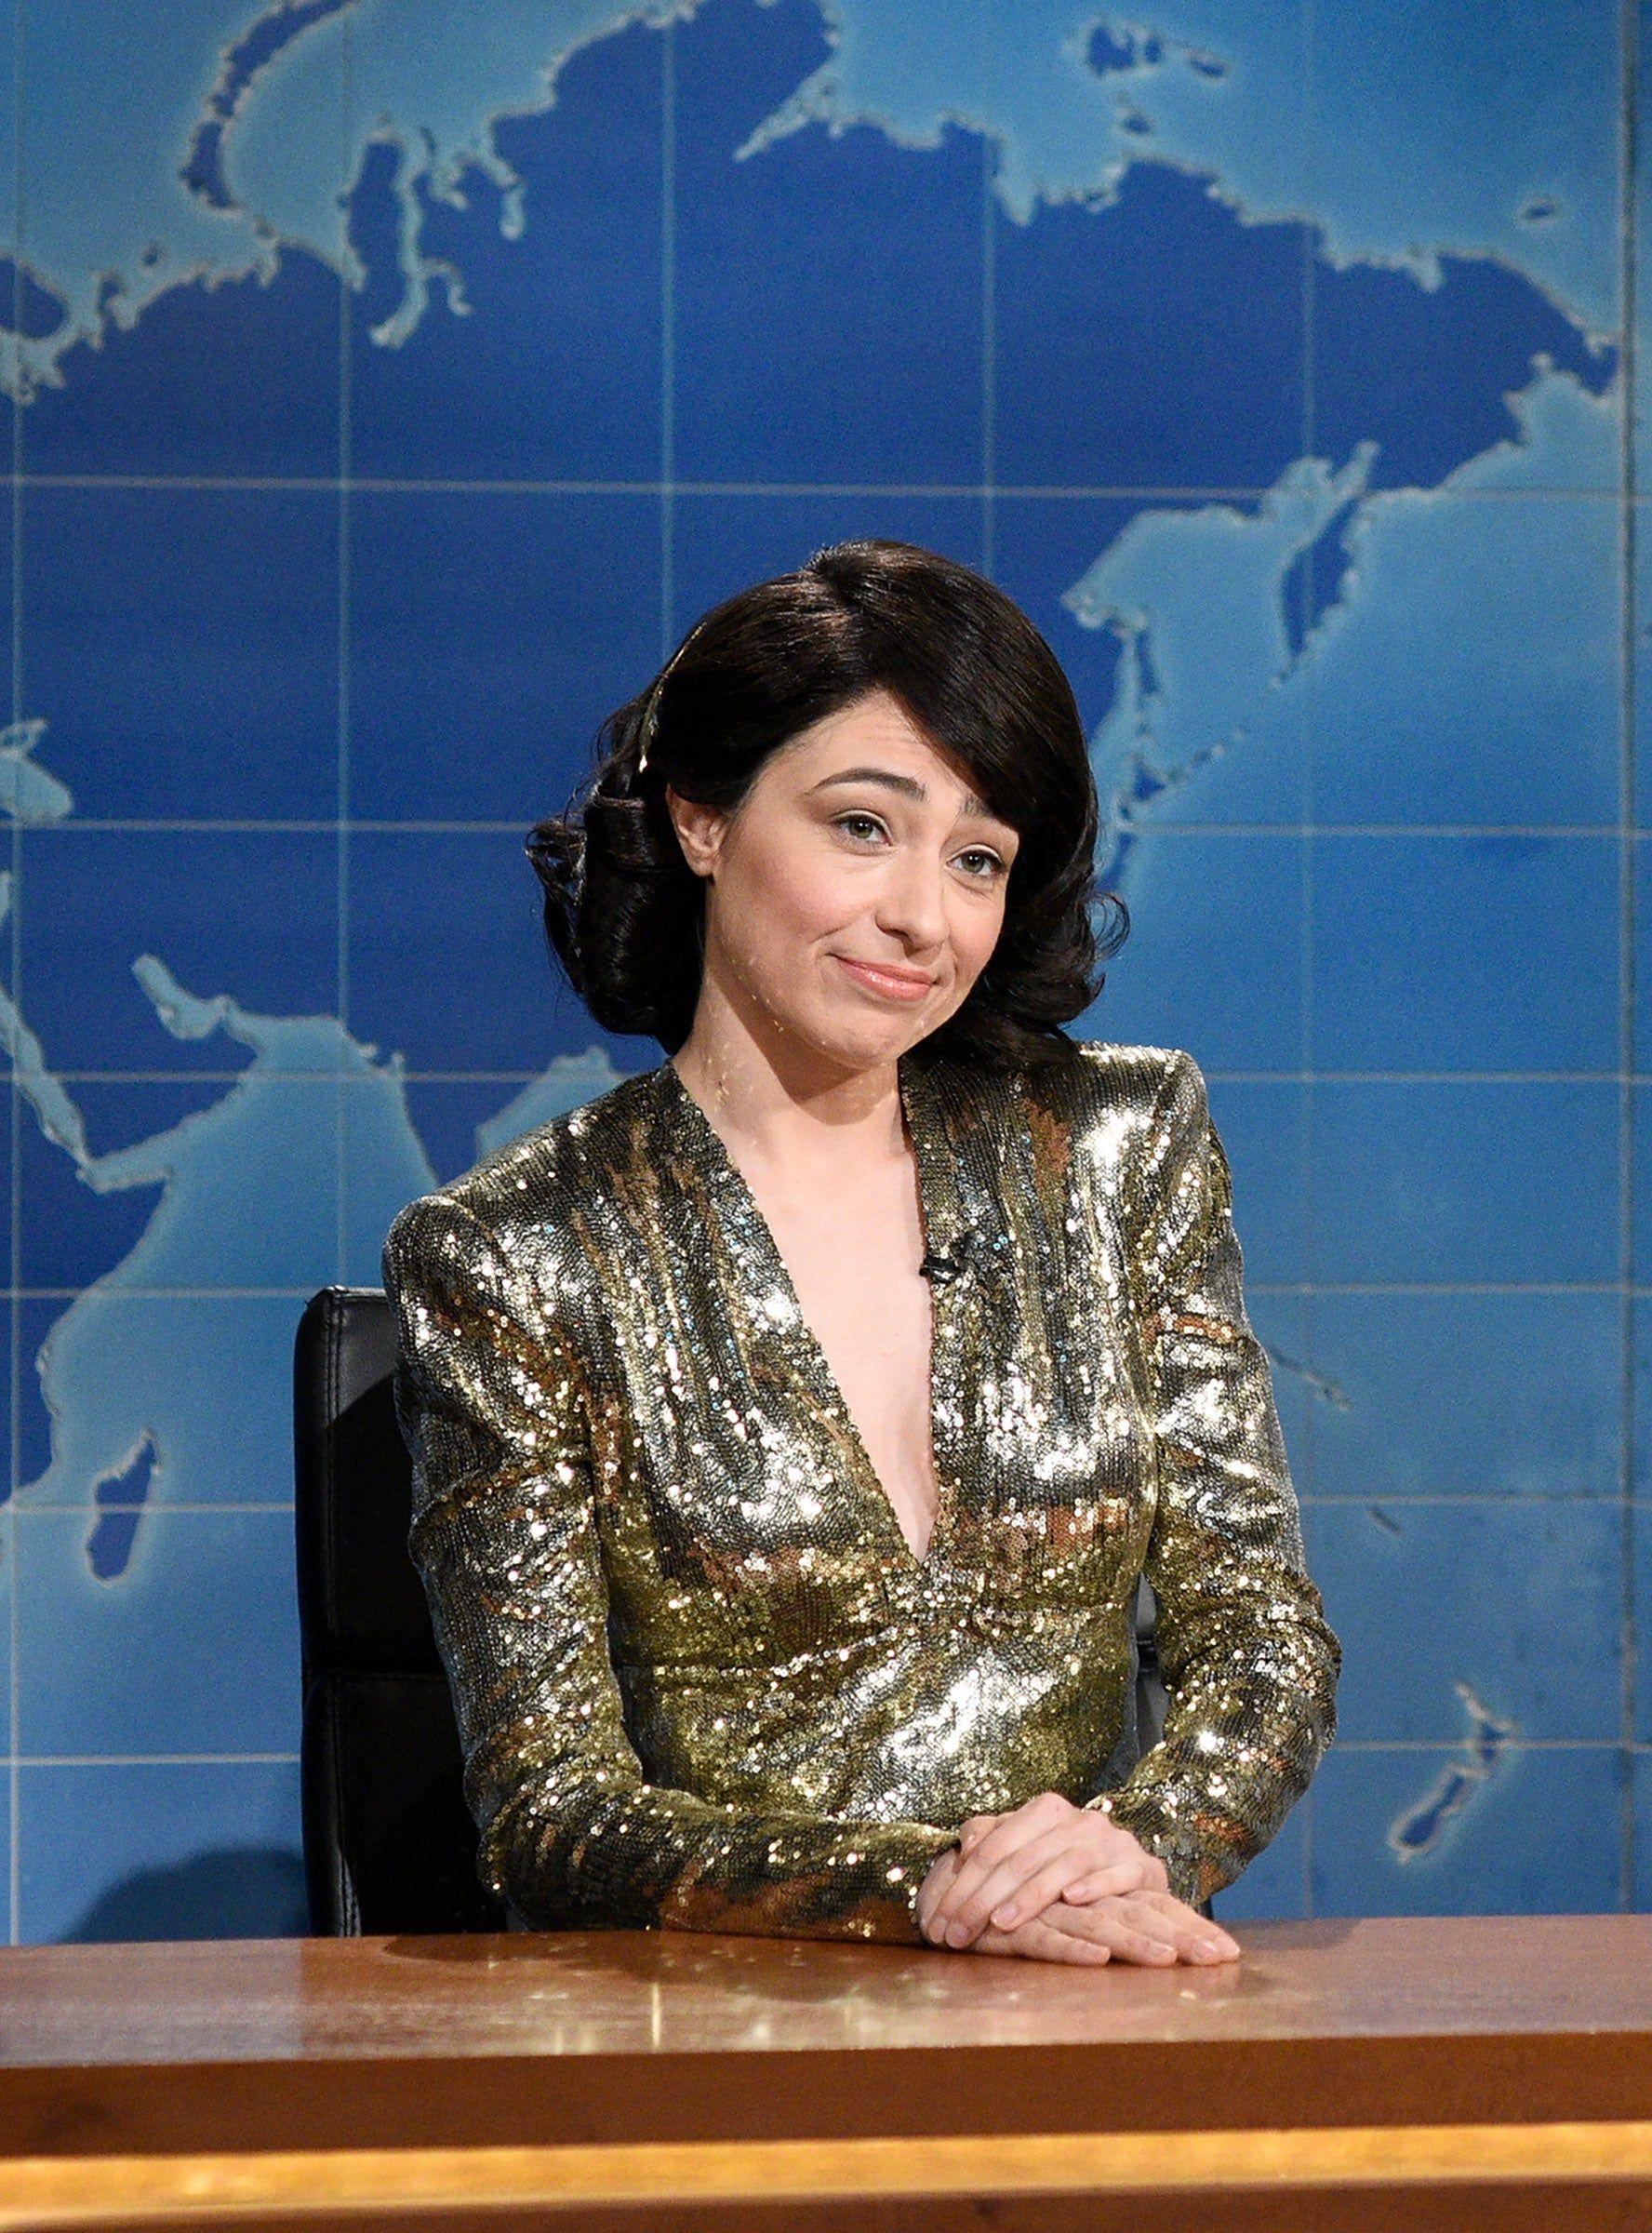 SNL's Melissa Villaseñor Roasted The Oscars For Rewarding